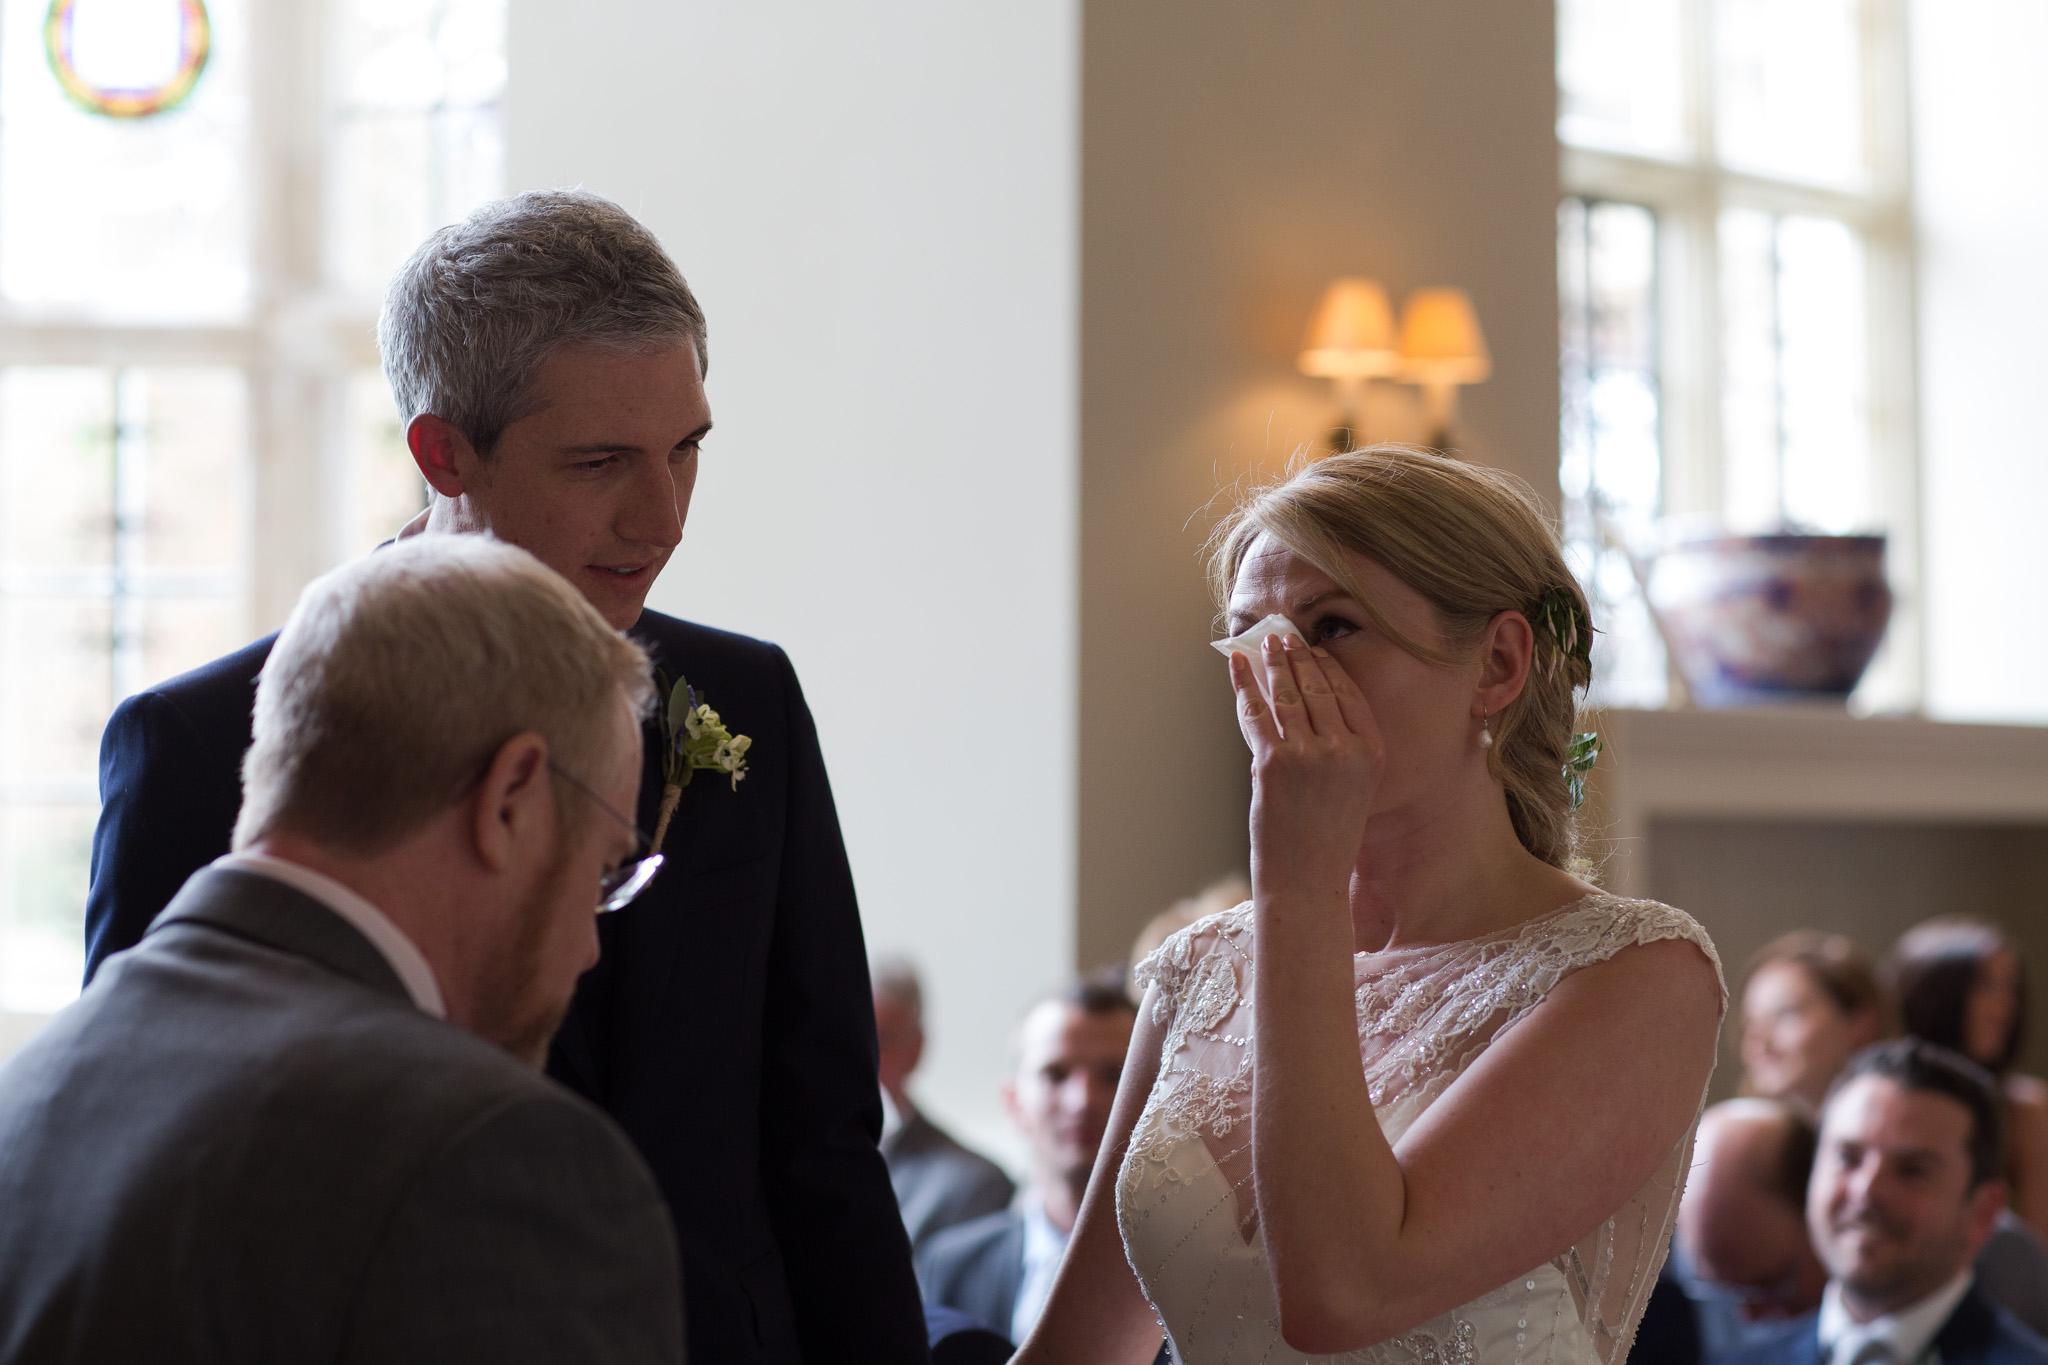 Mark_Barnes_Gloucester_Wedding_Photographer_Elmore_Court_Wedding_Photography_Mike+Kelly-41.jpg